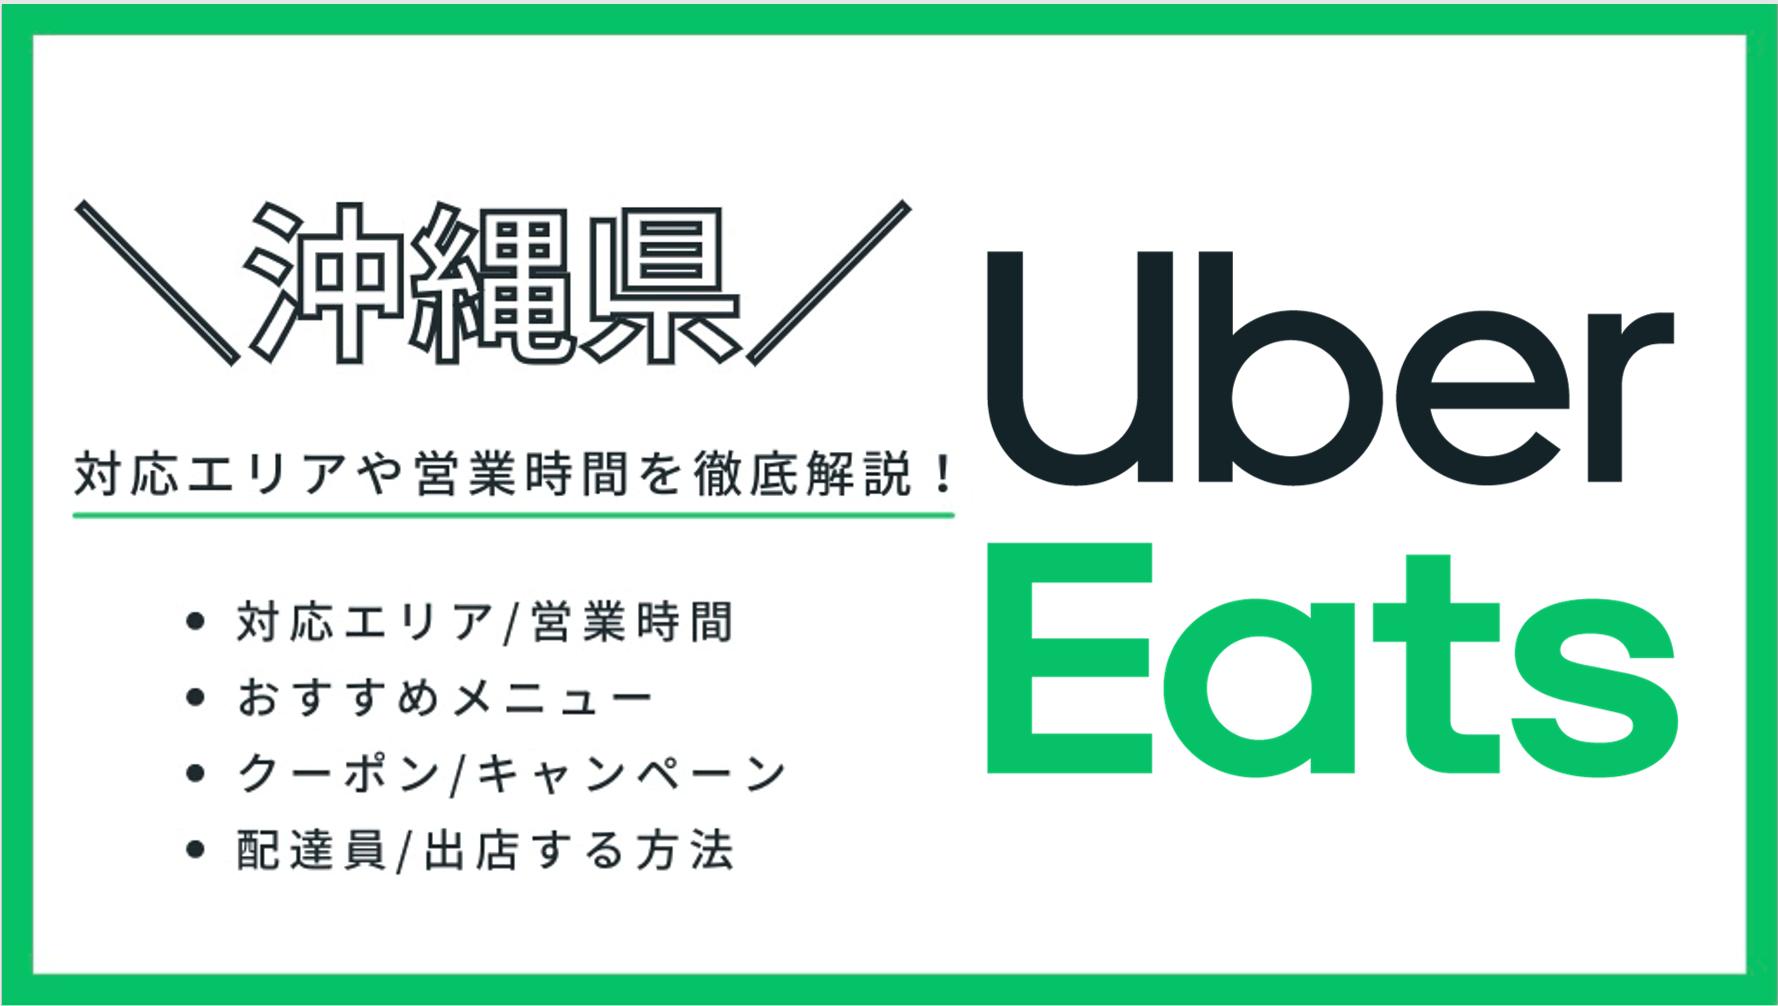 Uber Eats(ウーバーイーツ)沖縄県の配達エリア・料金・メニュー情報【クーポン・配達パートナー登録も】